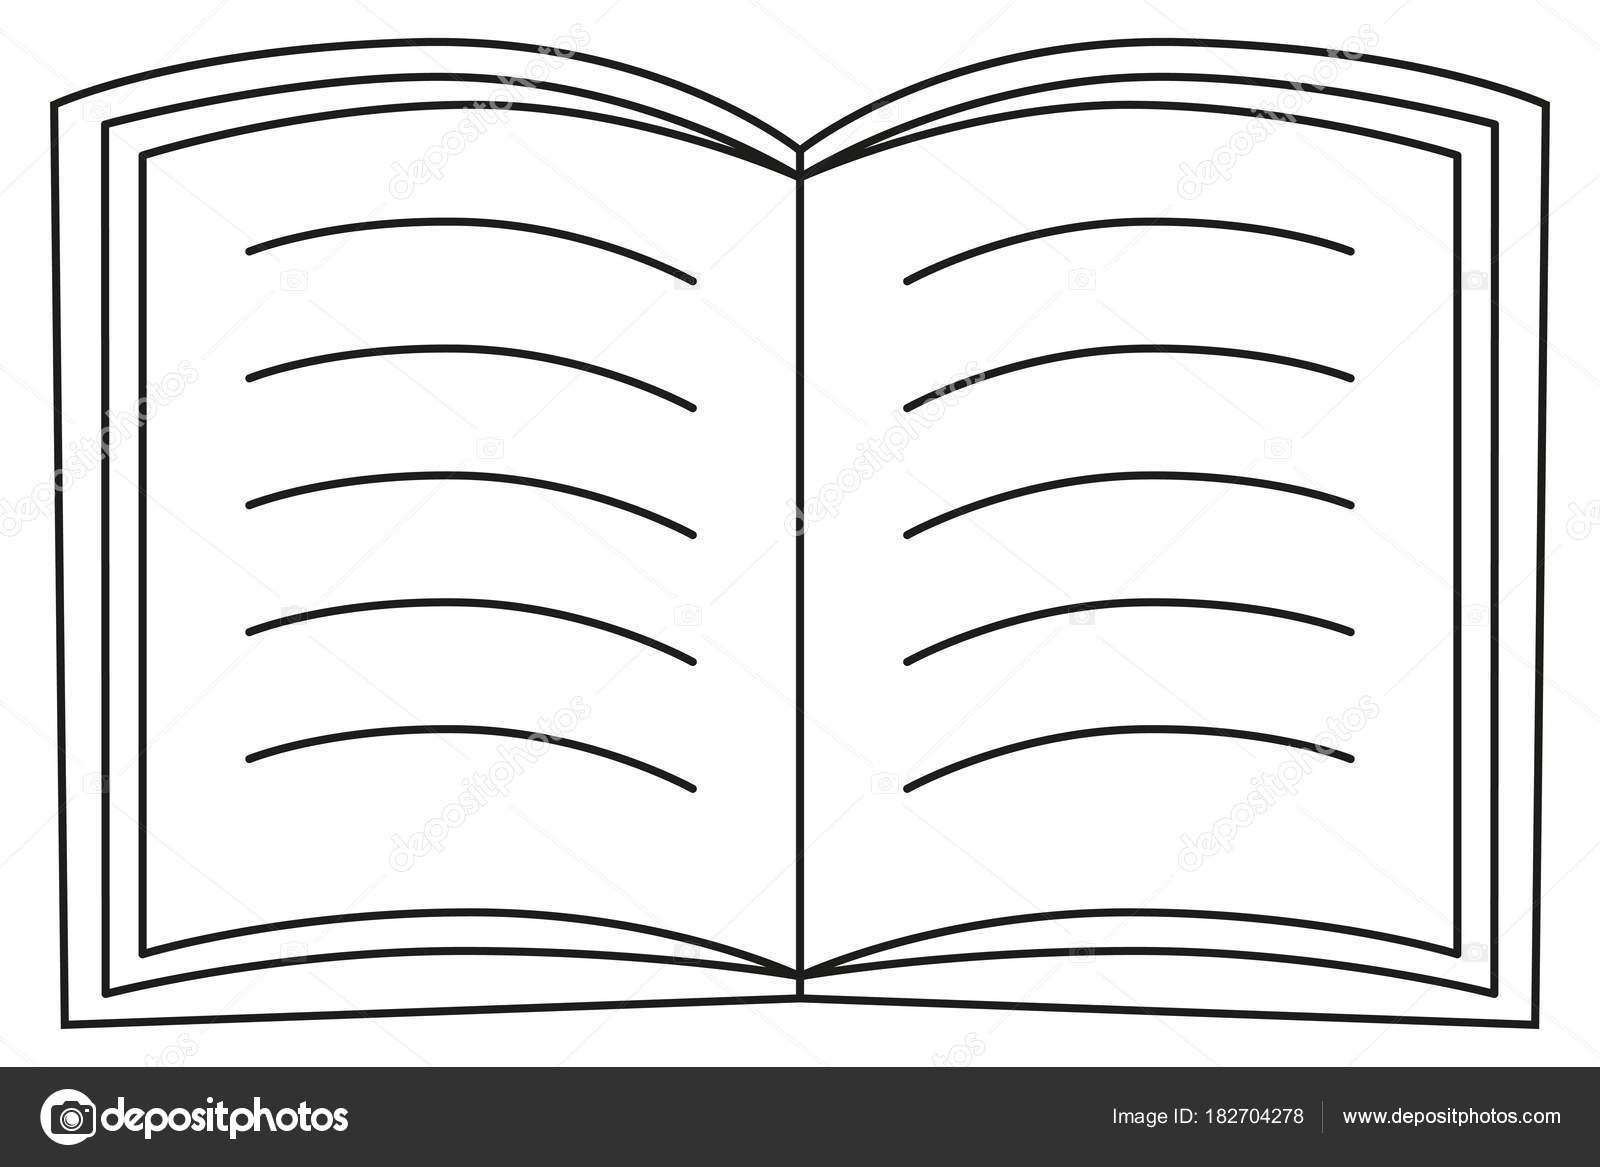 Schule Hochschule Universitat Linie Kunst Symbol Plakat Offenes Buch